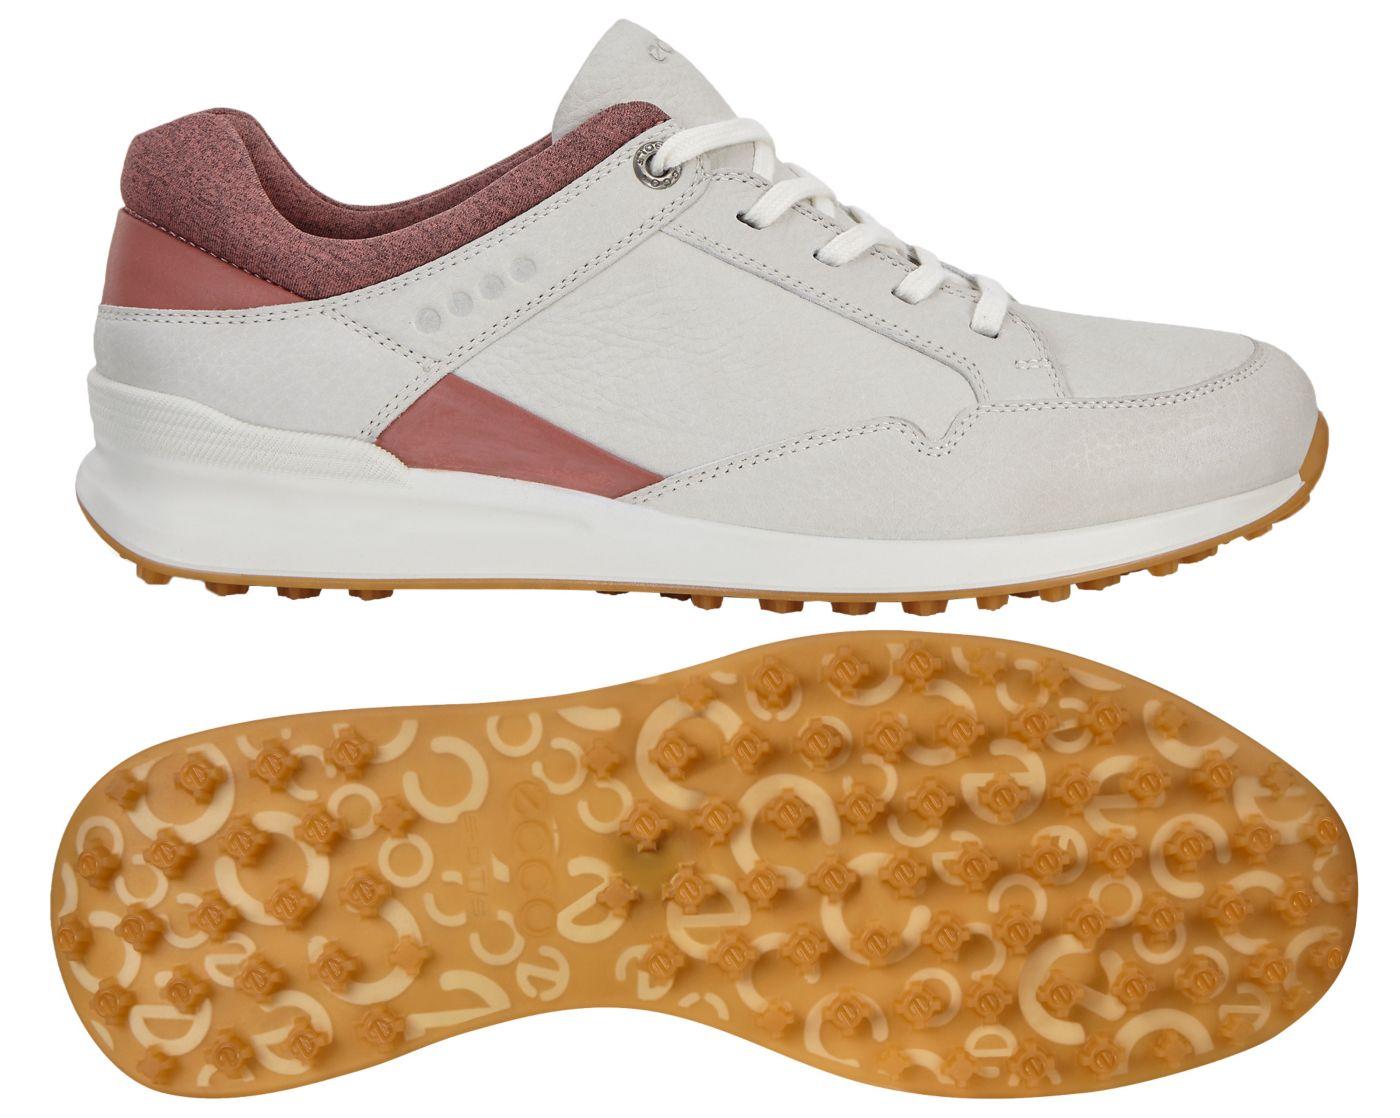 ECCO Women's Street Retro Golf Shoes